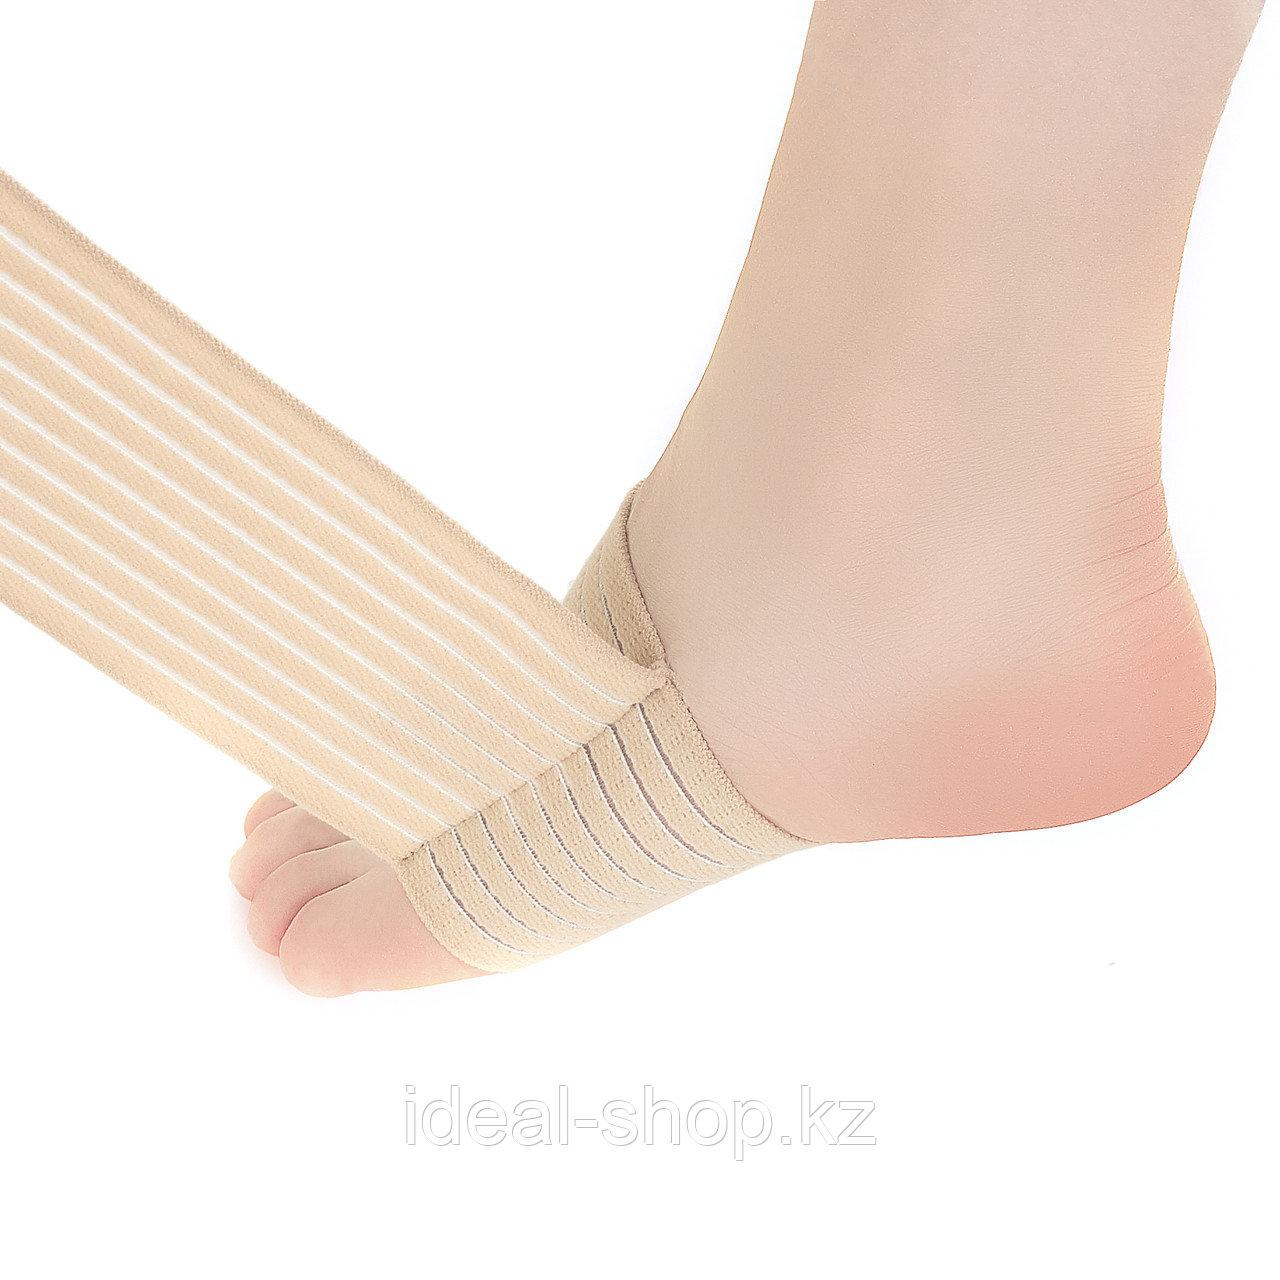 Бандаж на голеностопный сустав, регулируемый B.Well rehab W-347 - фото 2